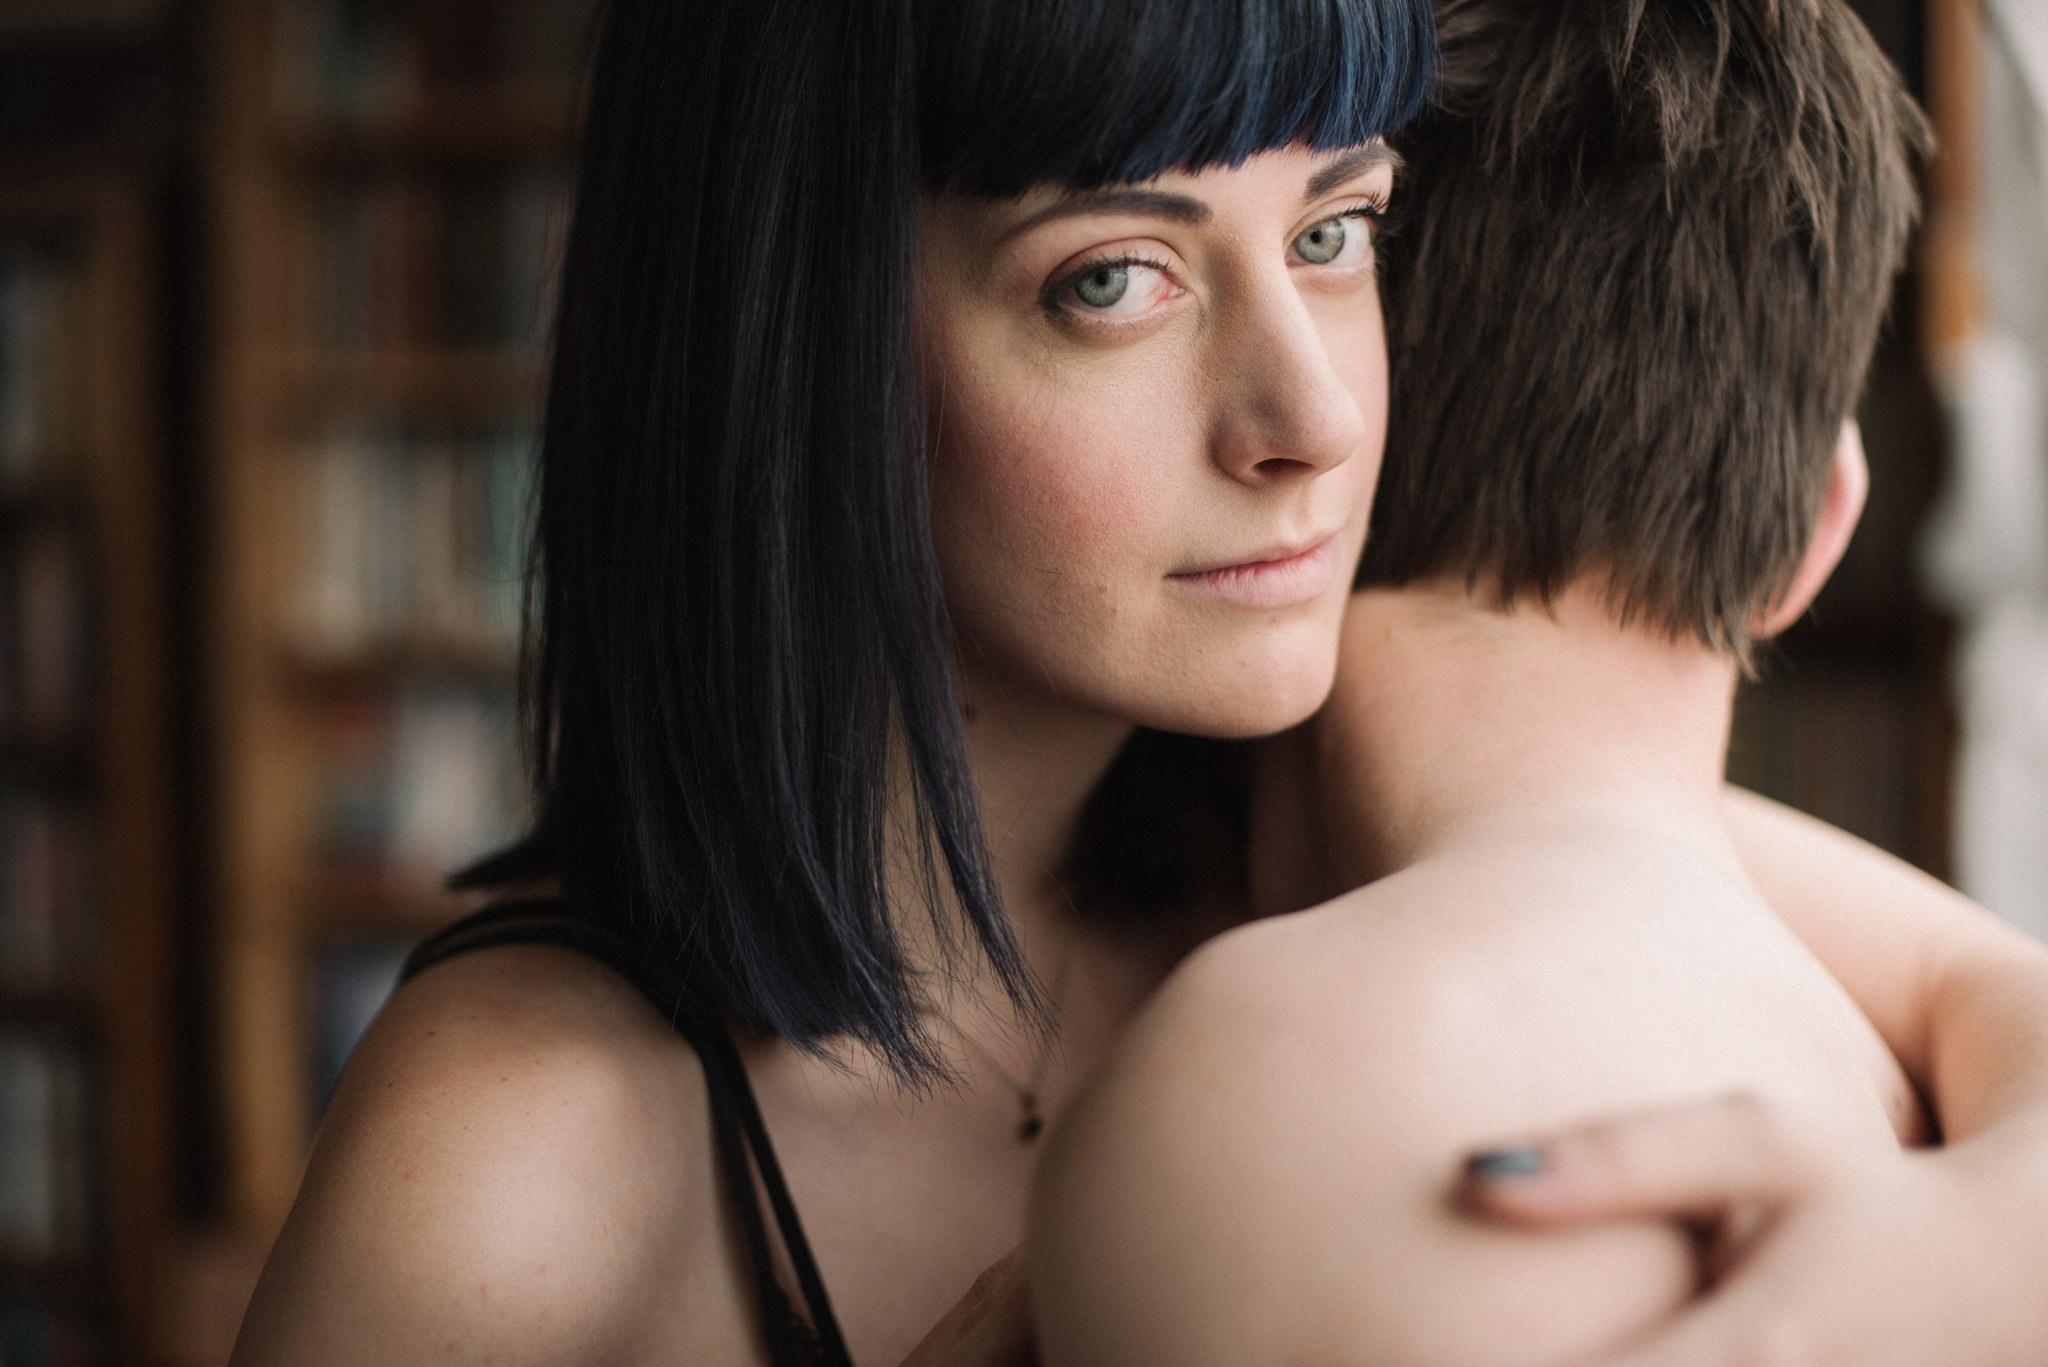 Daring Wanderer Photography - Daring Wanderer - Toronto portrait photographer - loft - industrial loft - Toronto - Toronto wedding photographer - intimate - couples session - intimate couples session